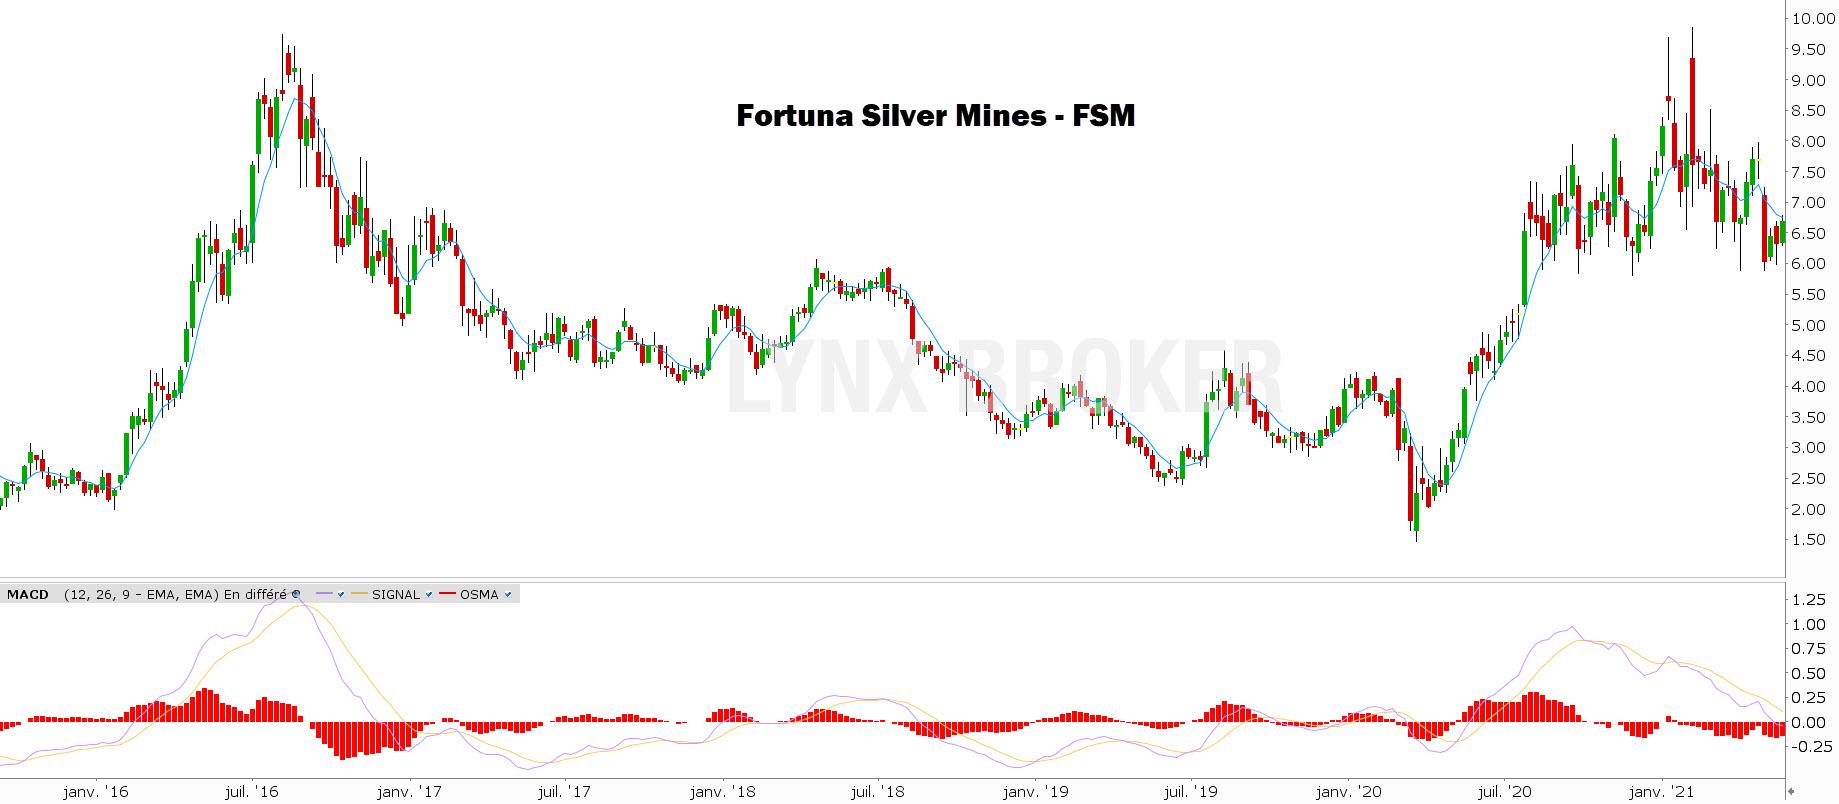 investir dans l'argent Fortuna Silver Mines